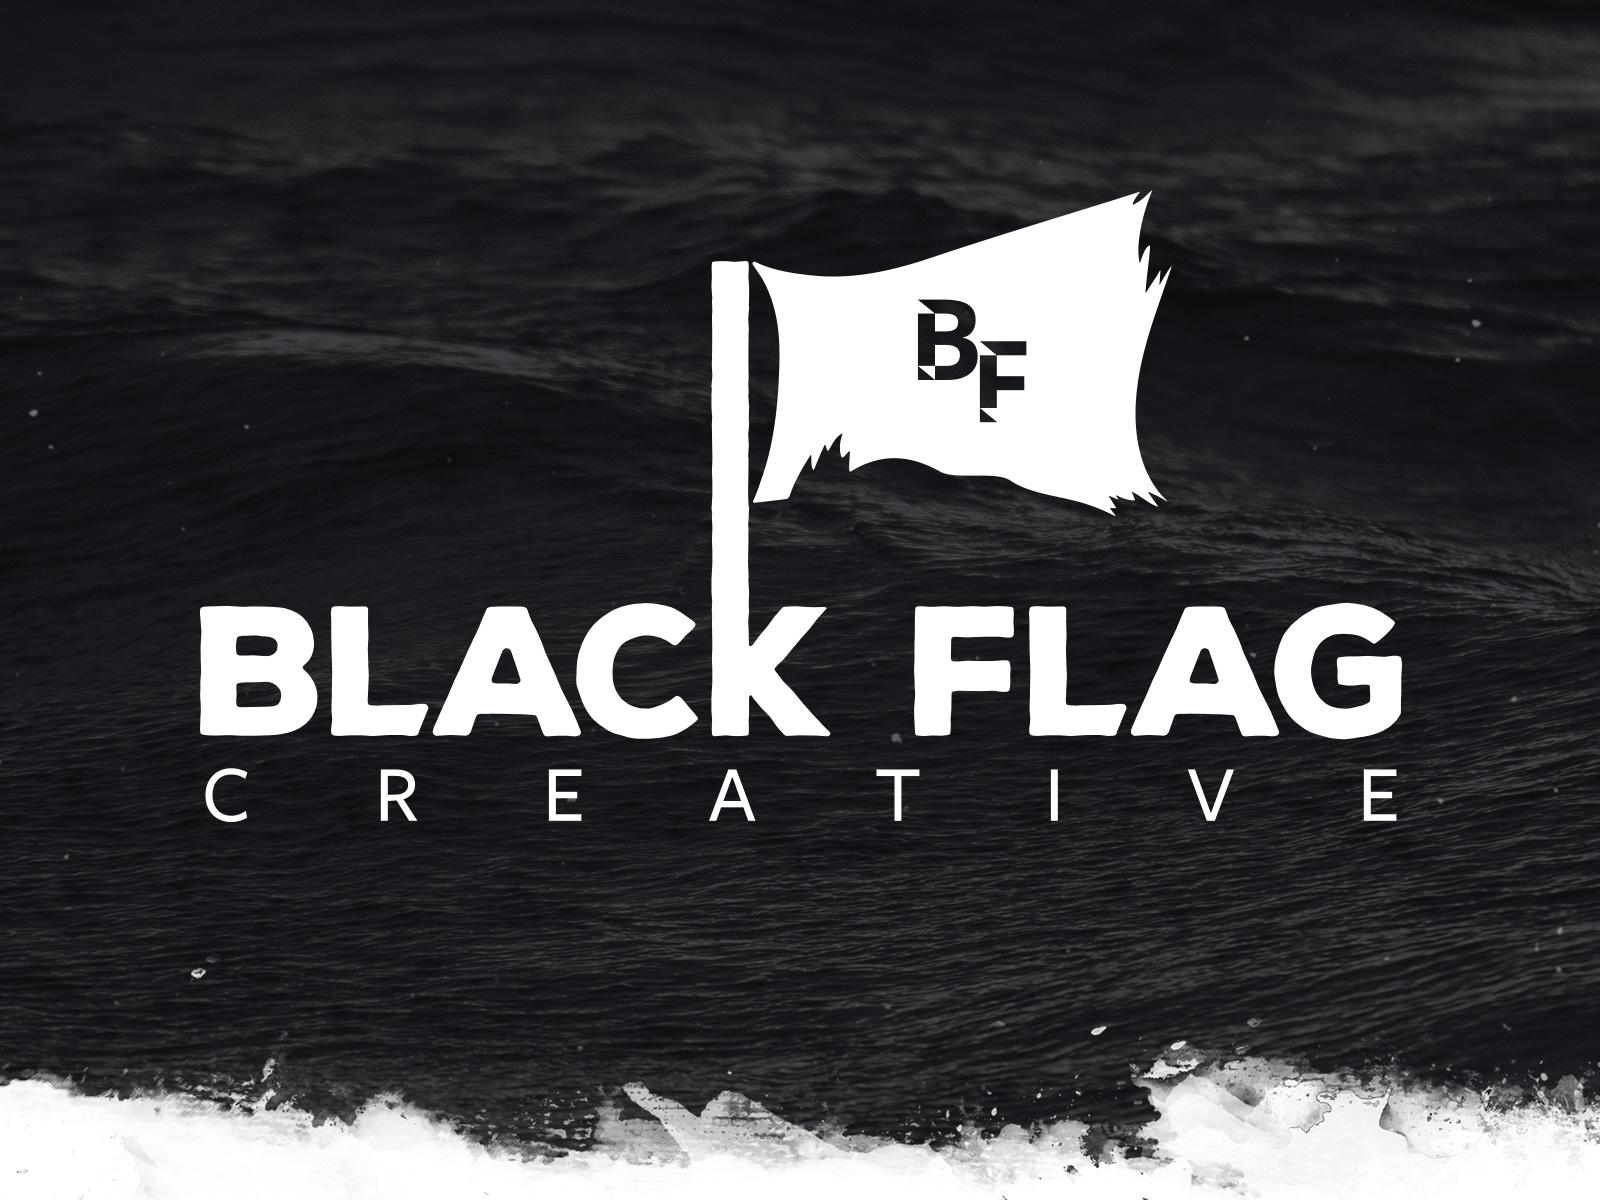 Blackflagcreativelogo large